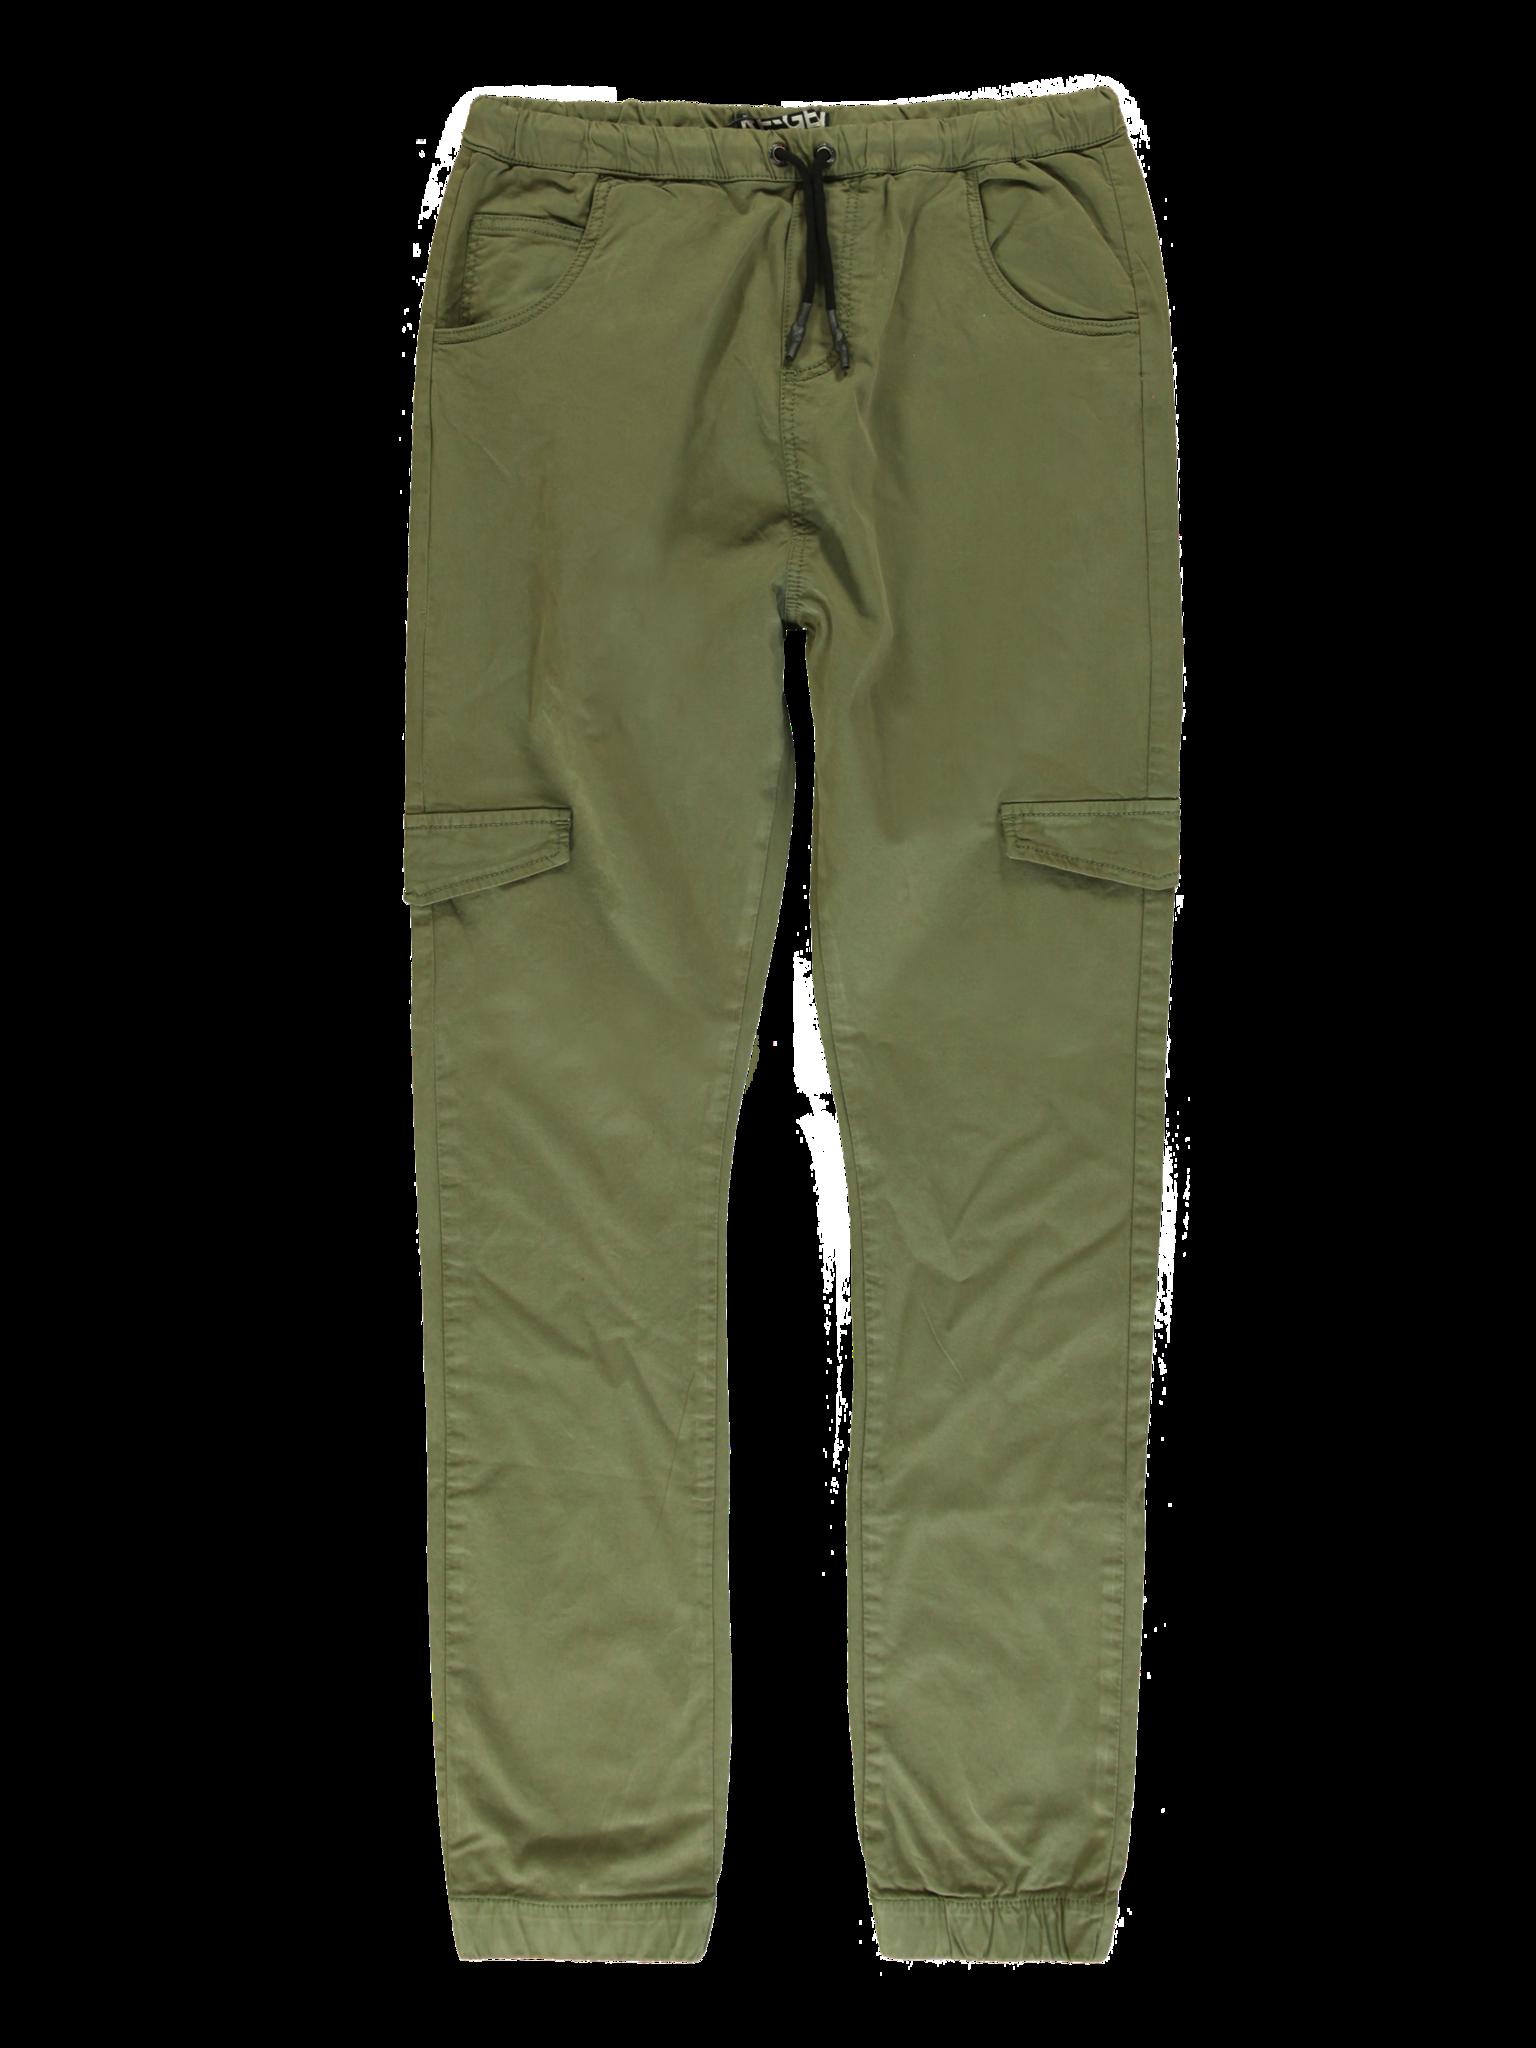 All Brands | Winterproducts Men | Pants | 12 pcs/box